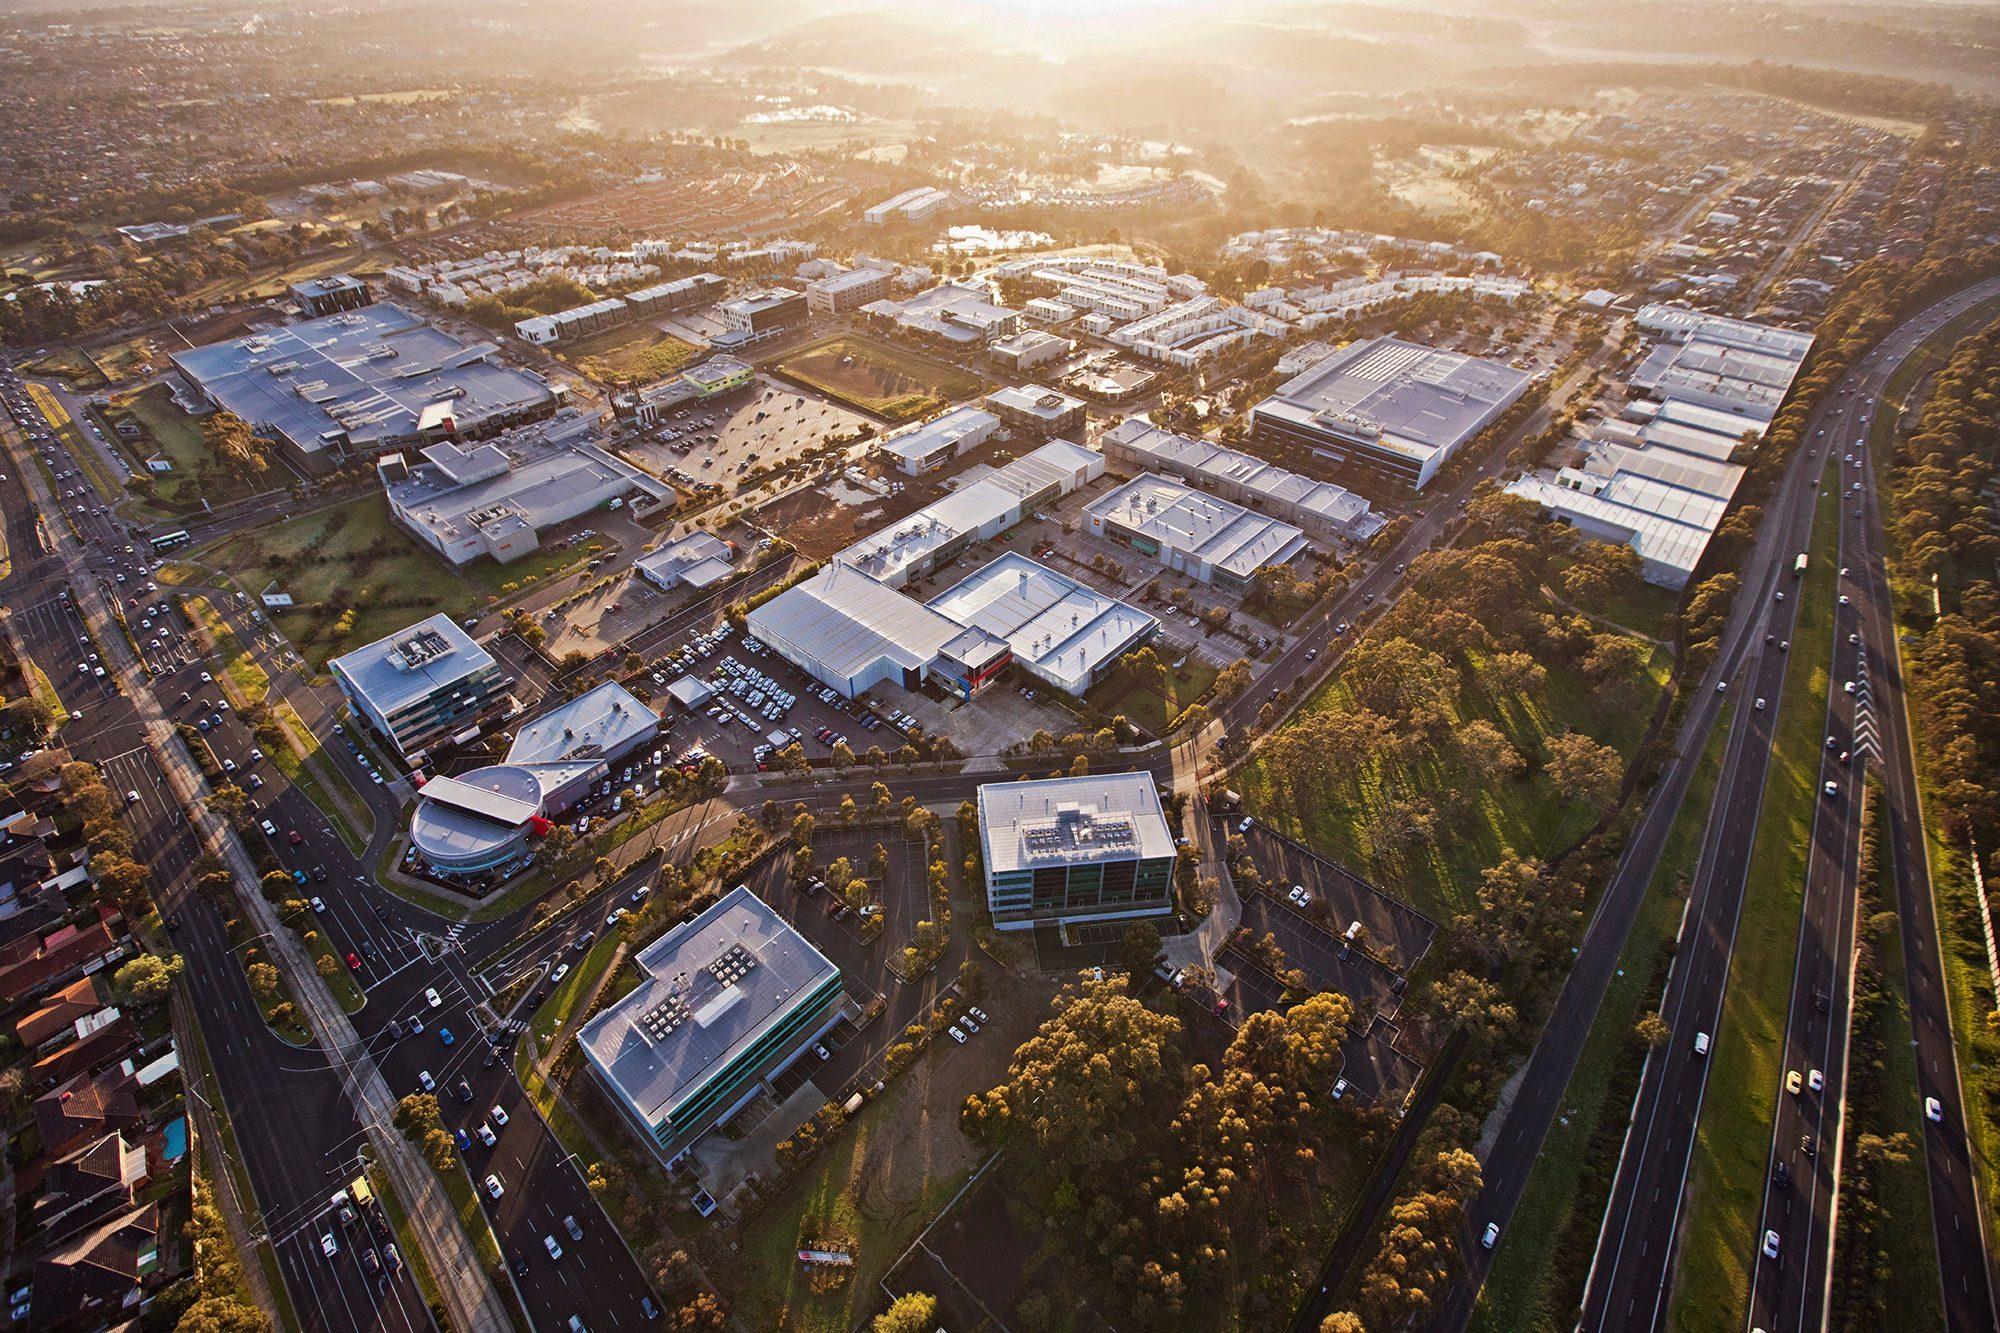 University Hill Aerial shot